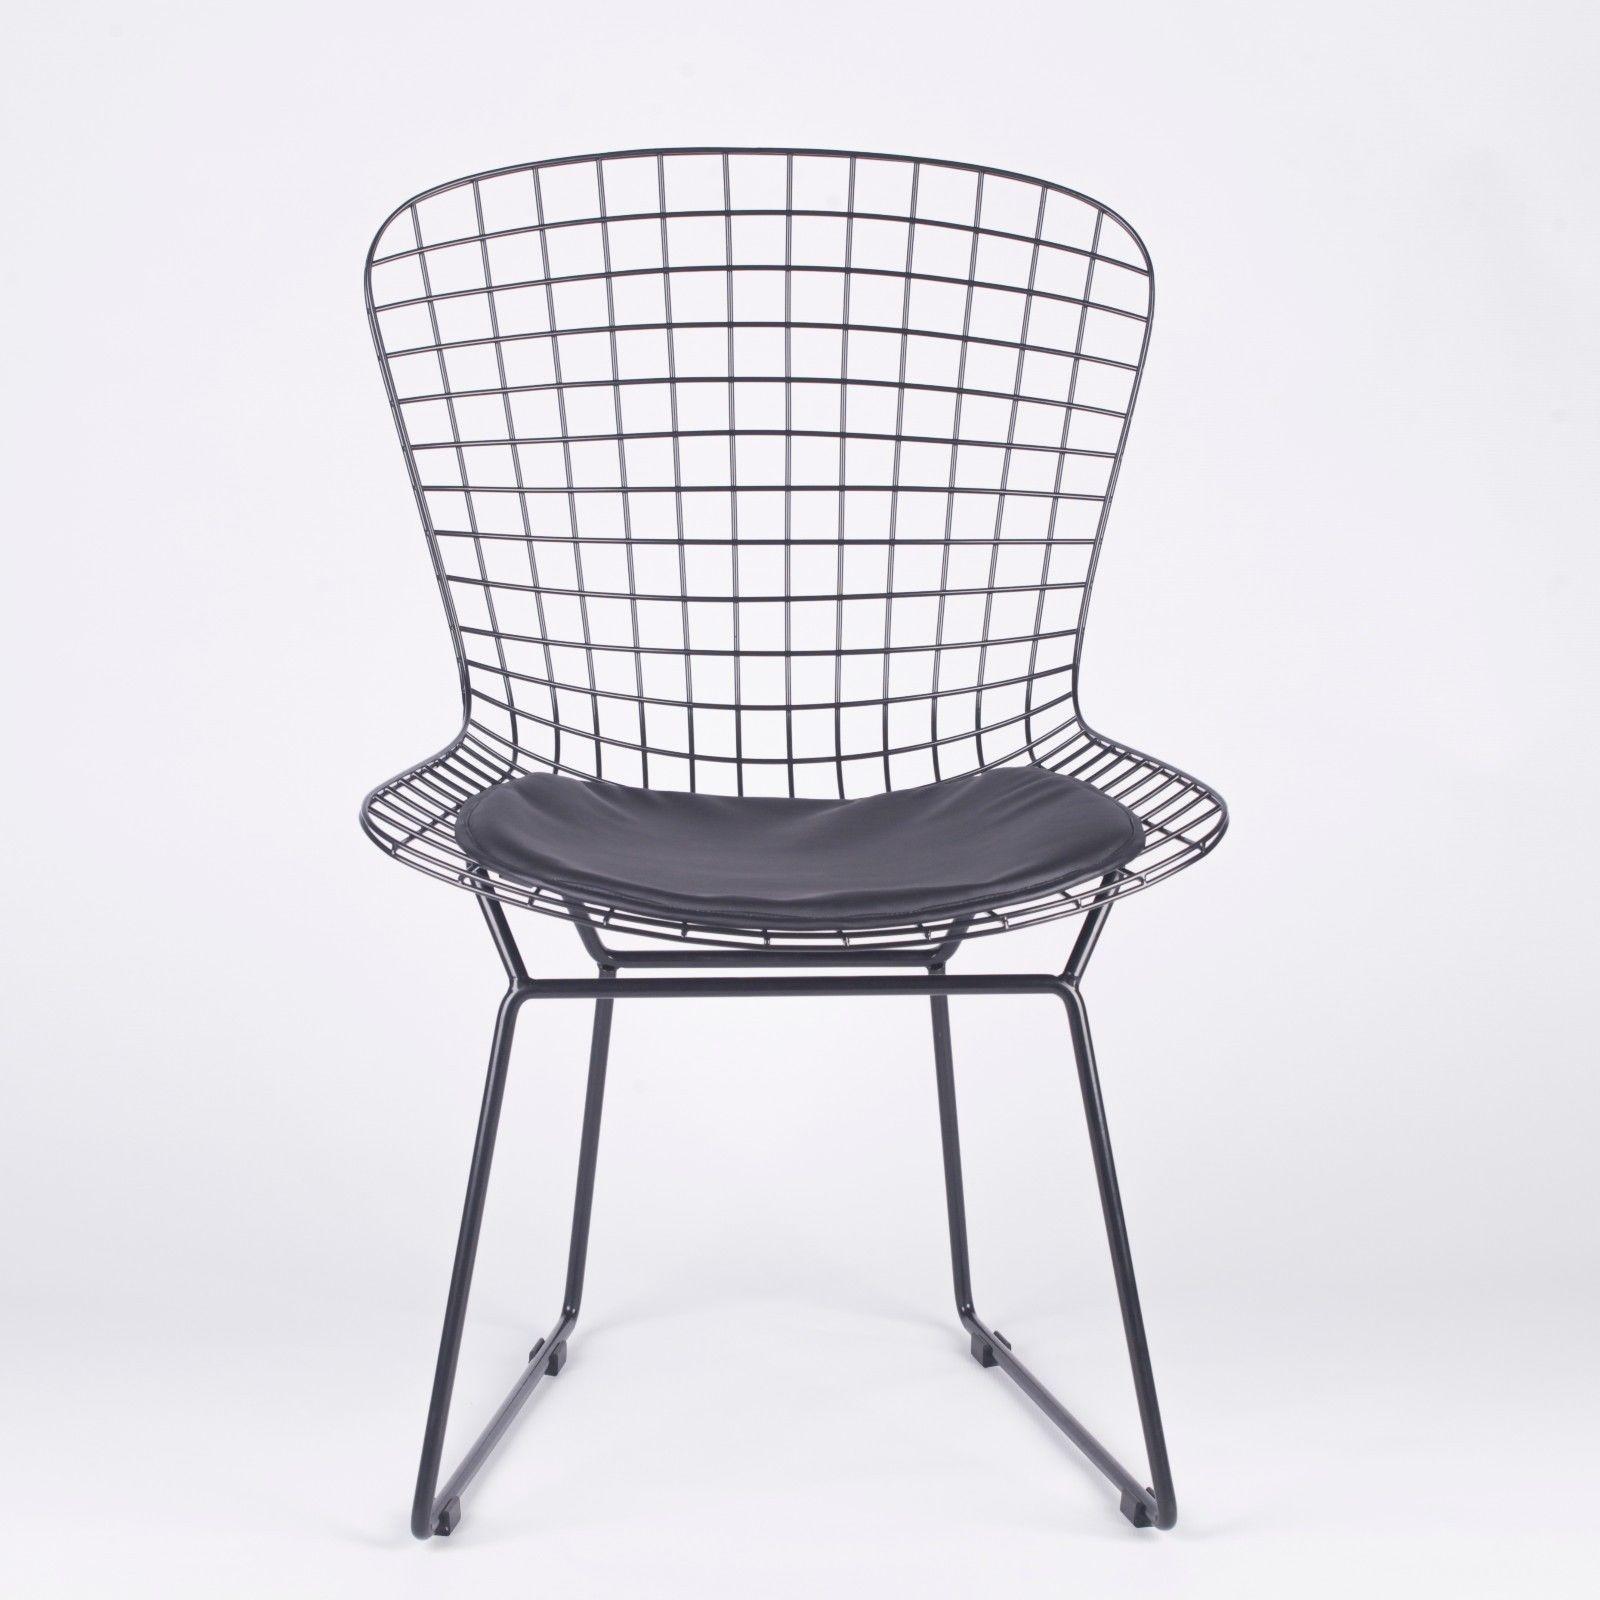 Black Mesh Wire Dining Chair Furniture  La Maison Chic